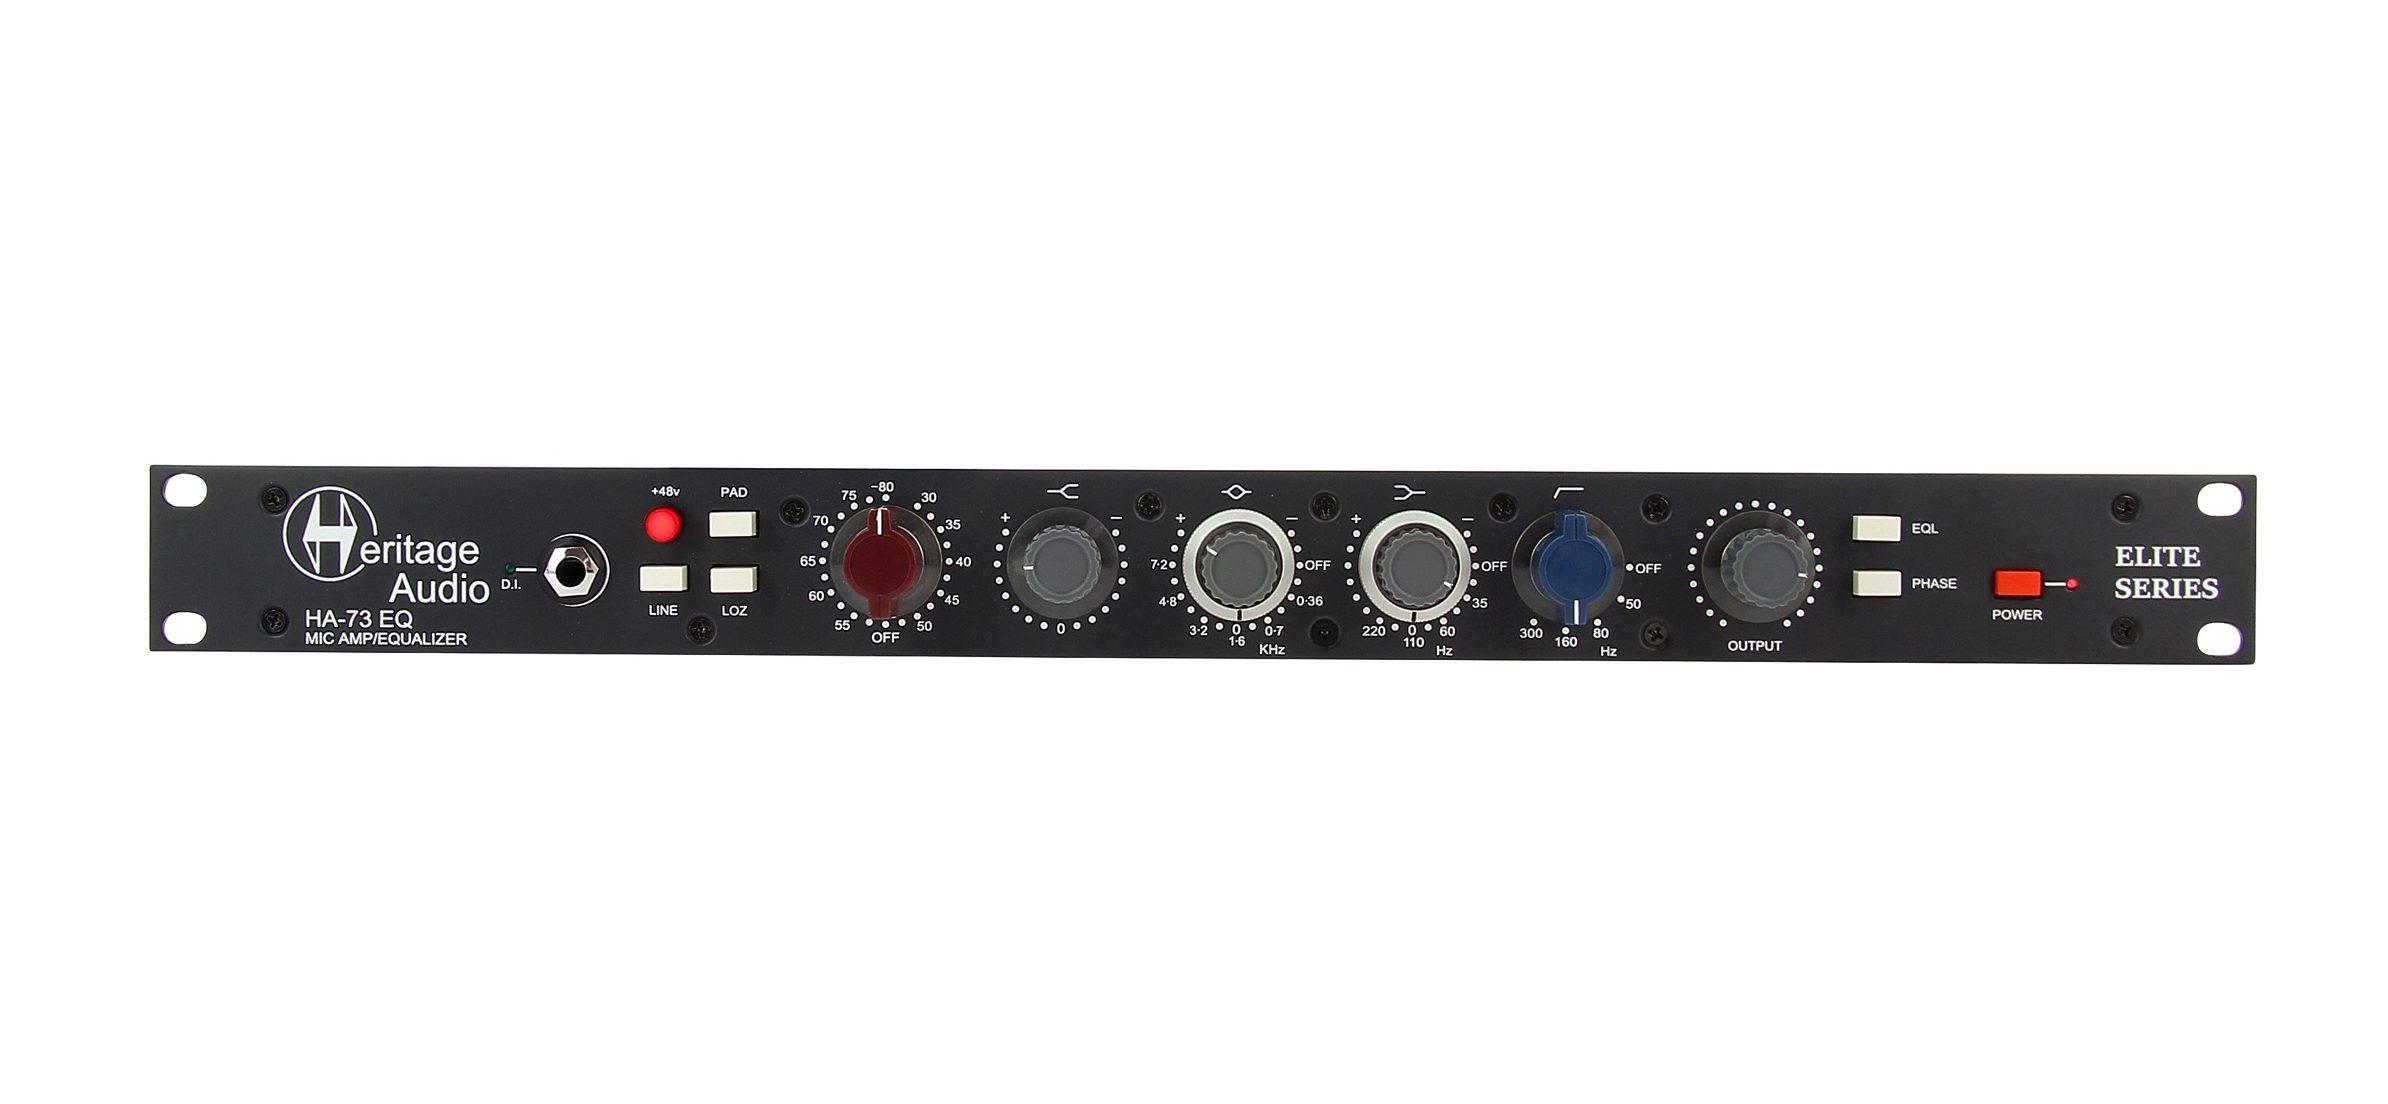 heritage audio pre eq outboard hardware midi music test audiofader